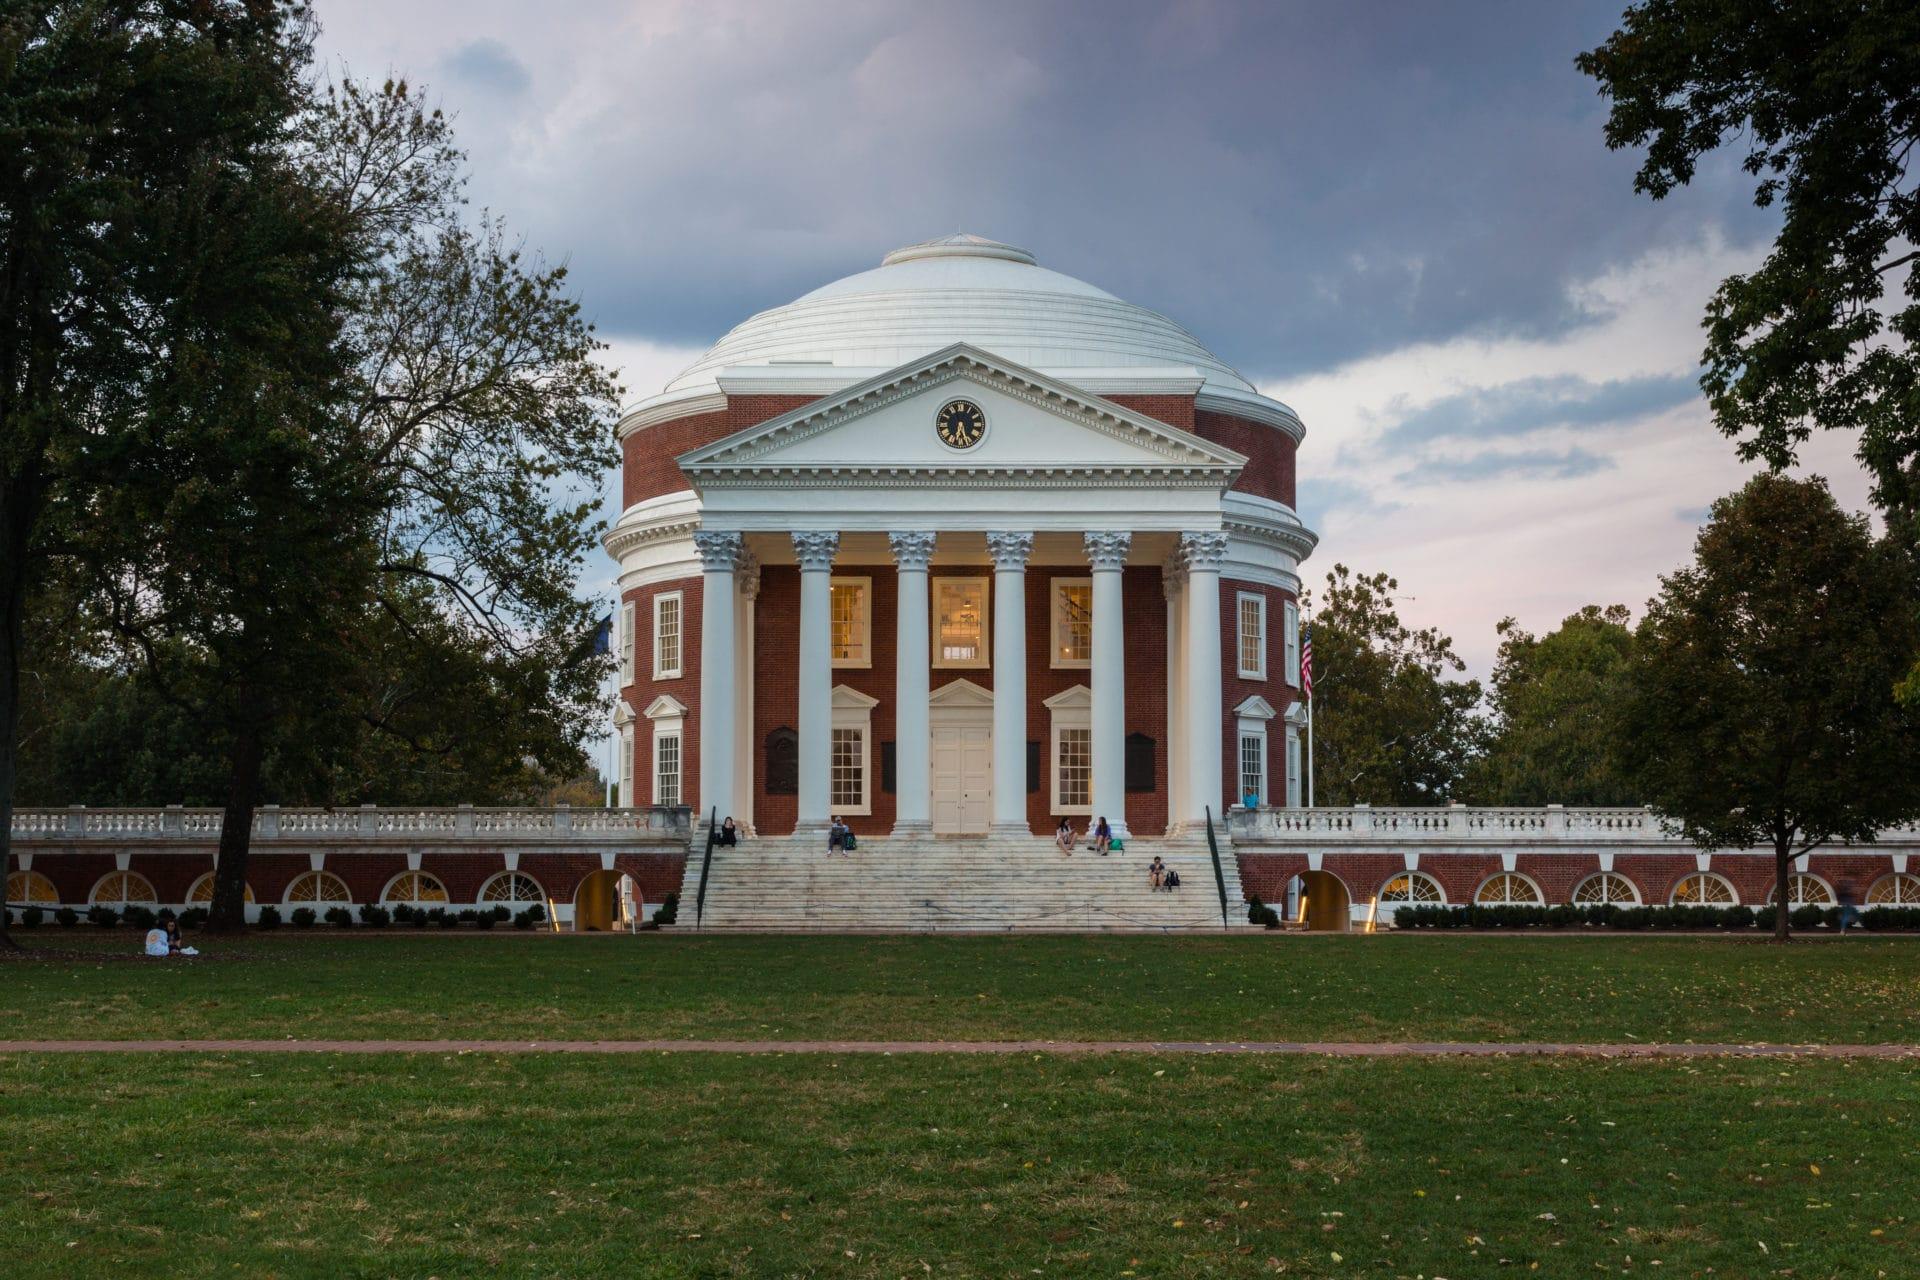 University Of Virginia Rotunda Riddleberger Brothers Inc